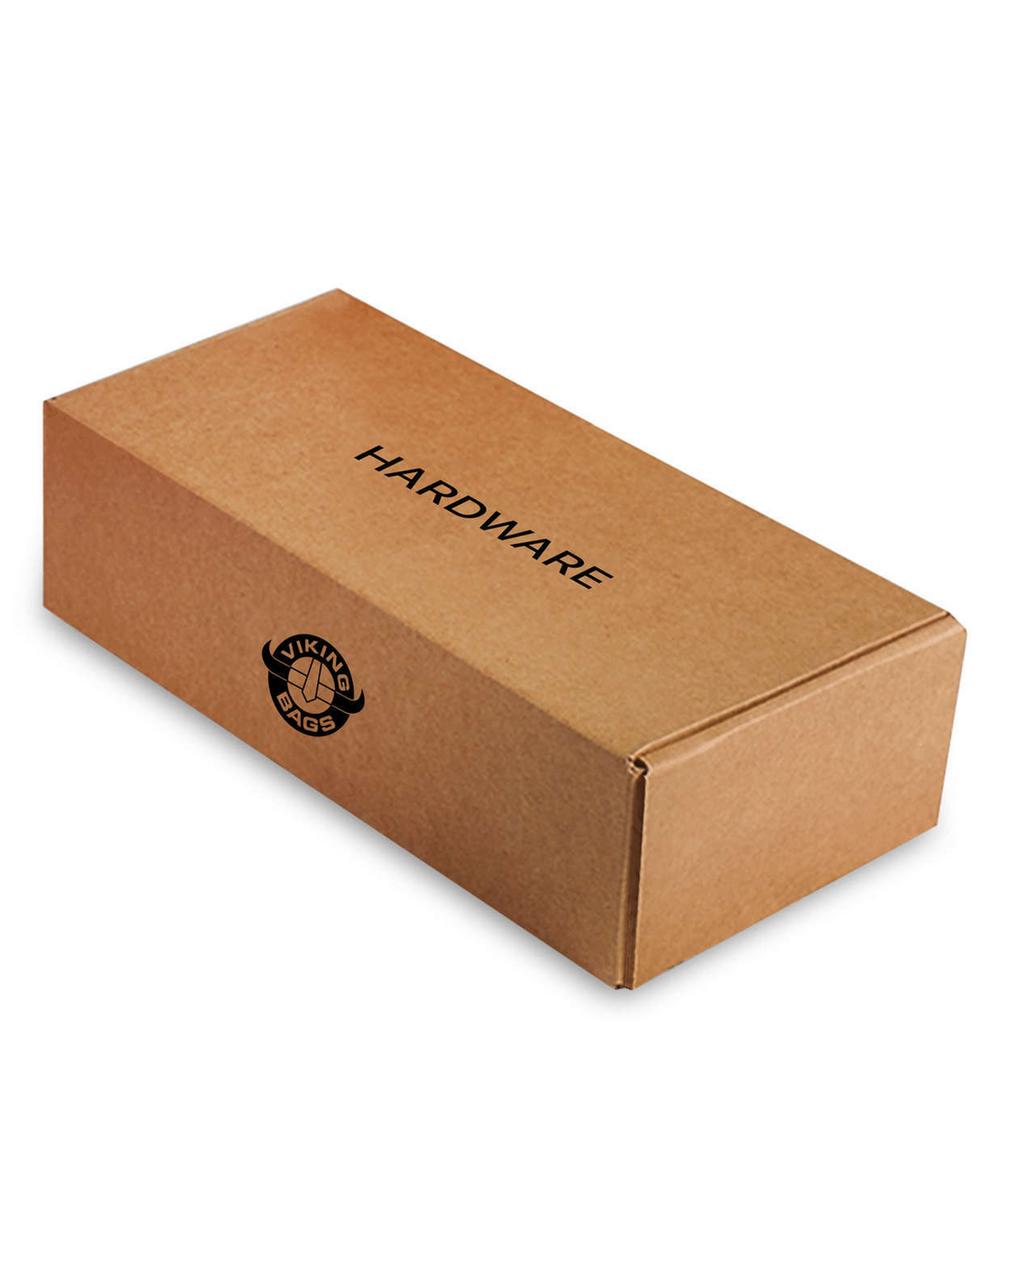 Honda 1500 Valkyrie Standard Uni Warrior Slanted M Motorcycle saddlebags Box